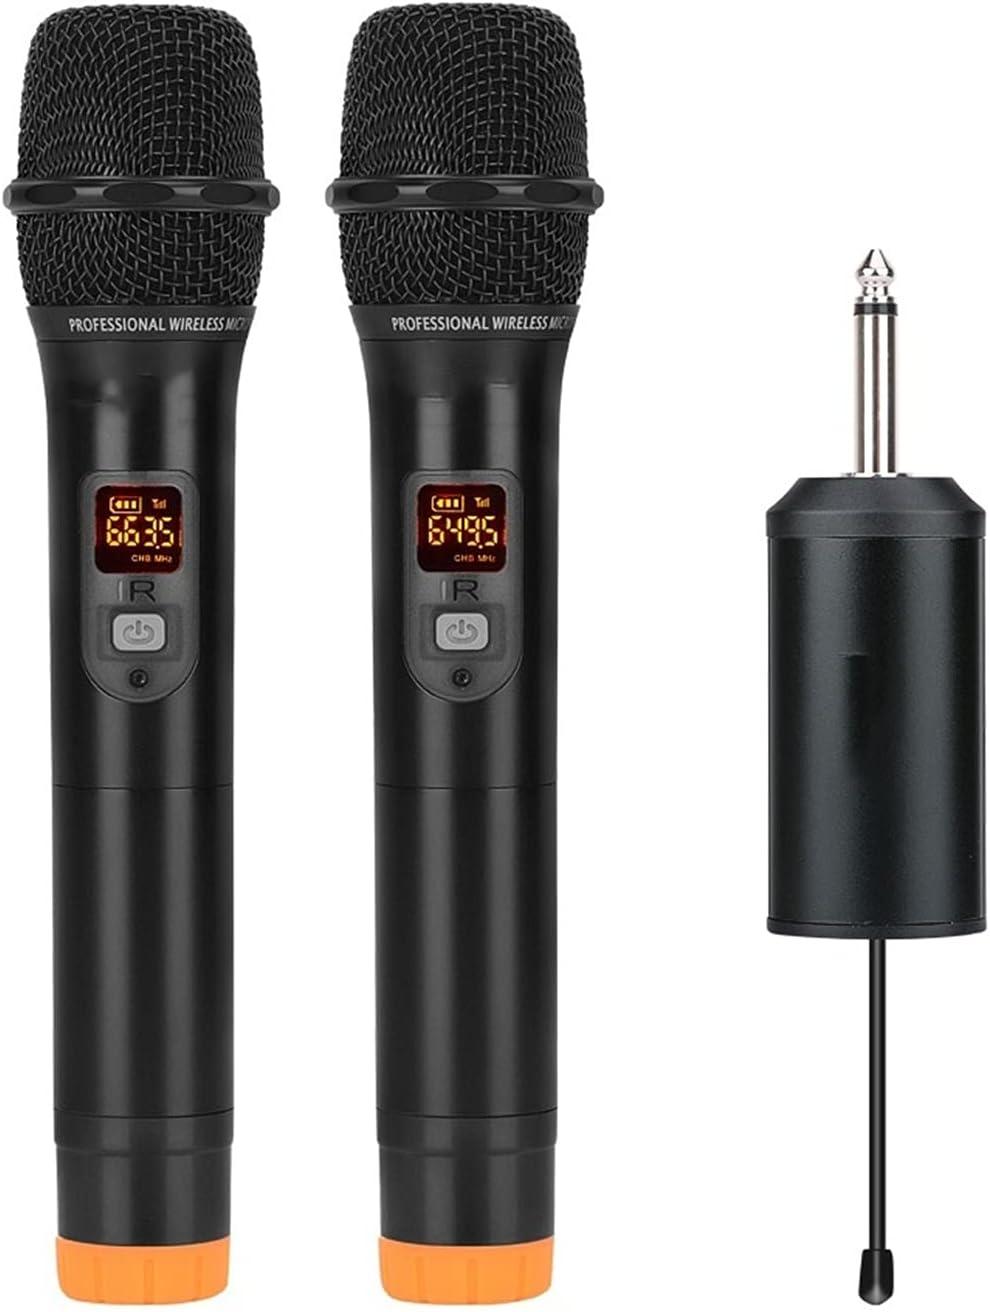 zlw-shop UHF Wireless service Microphone service System Handheld Profe Mic Metal